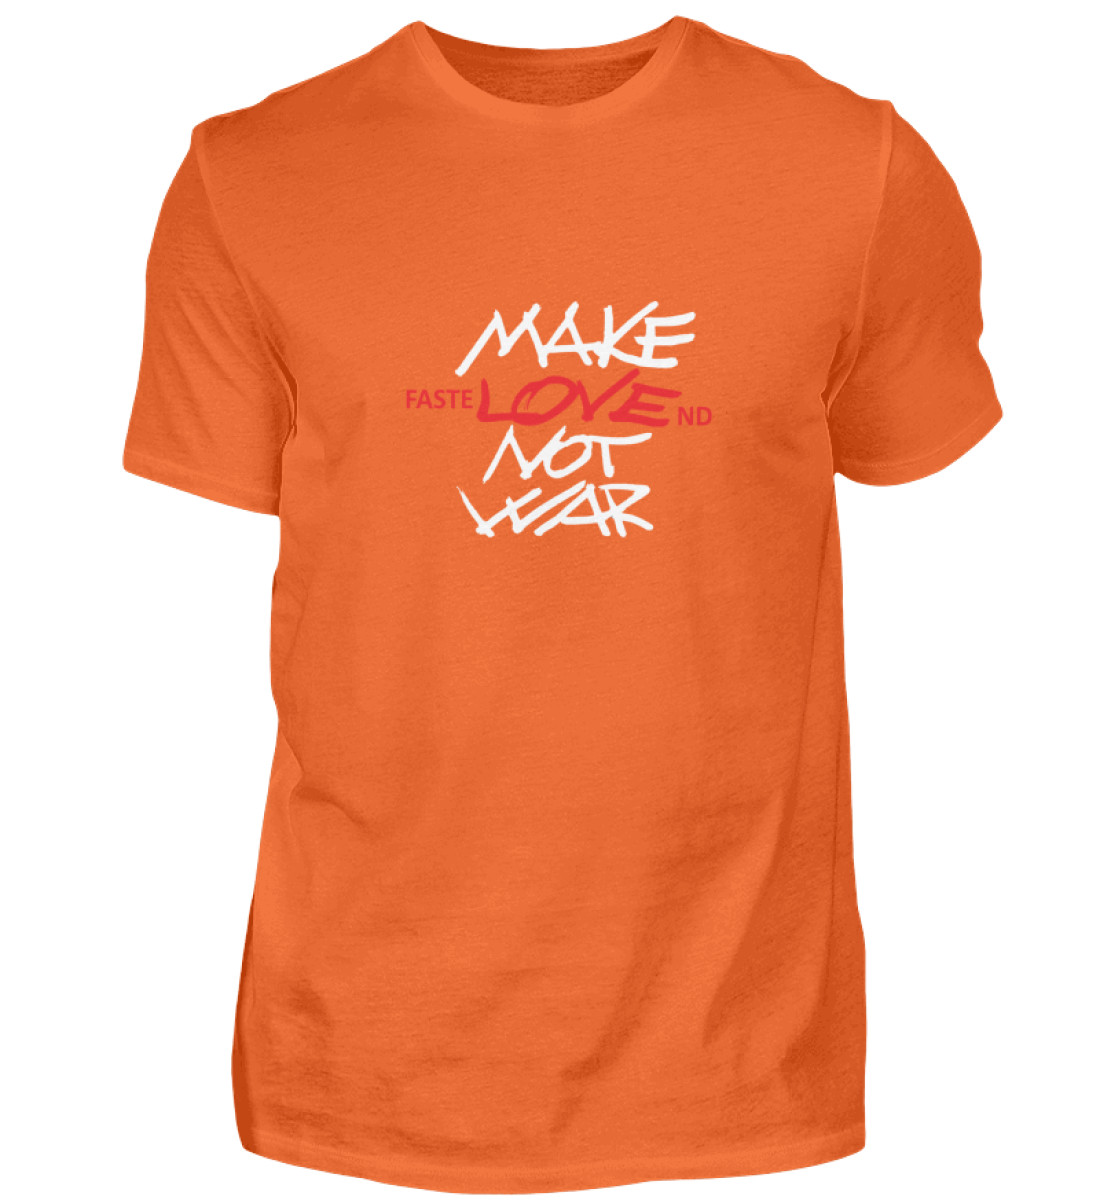 FasteLOVEnd Herren T-Shirt - Herren Shirt-1692